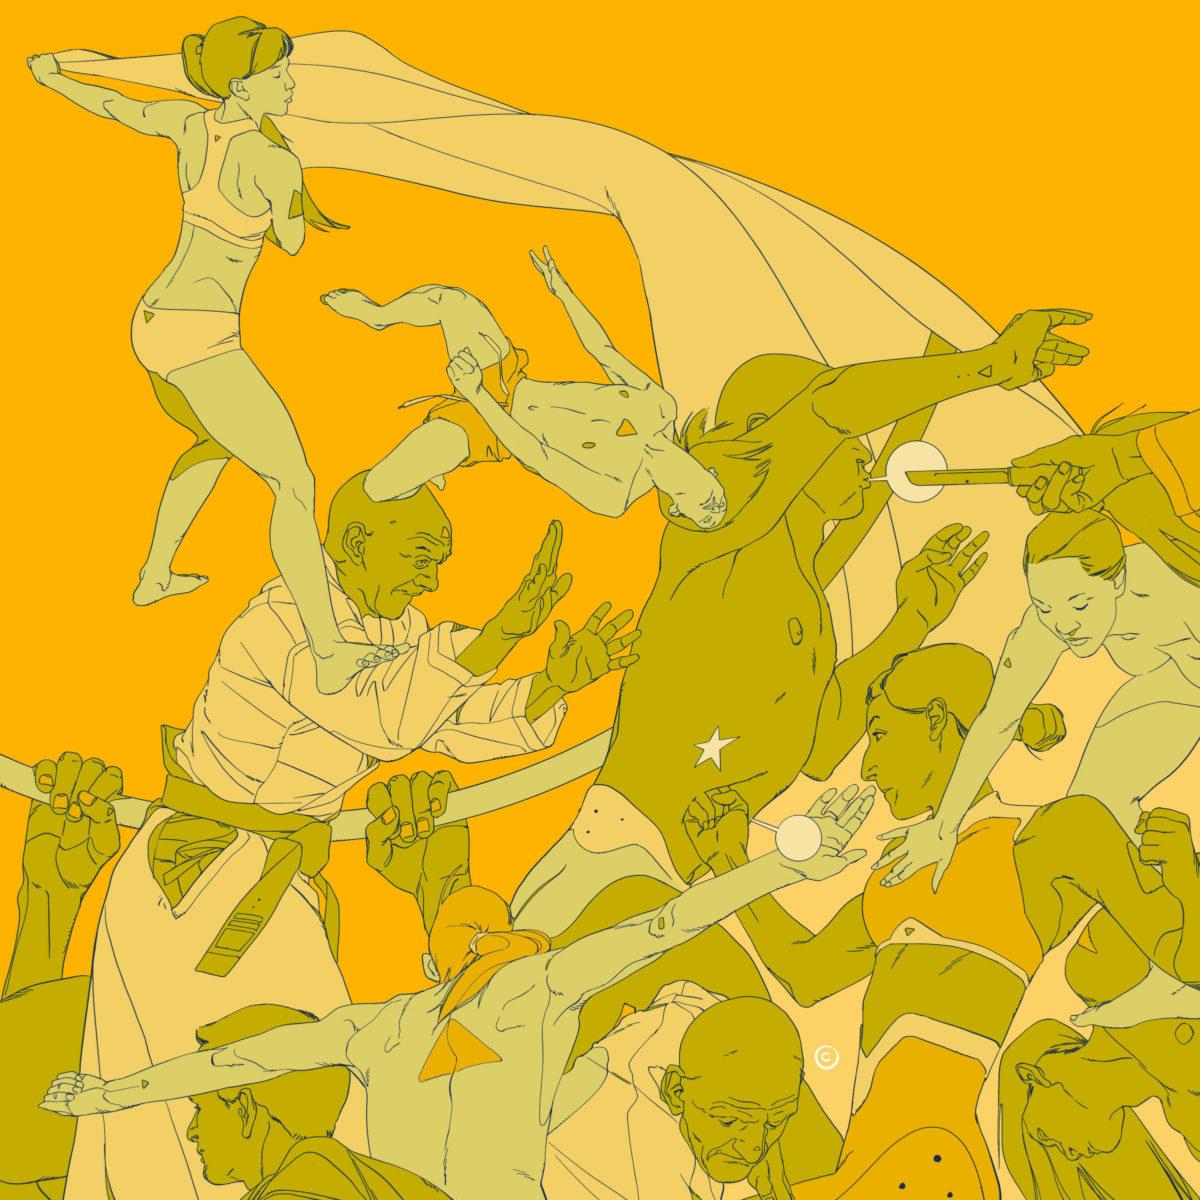 Calum Alexander Watt - Study for Bodies in Motion